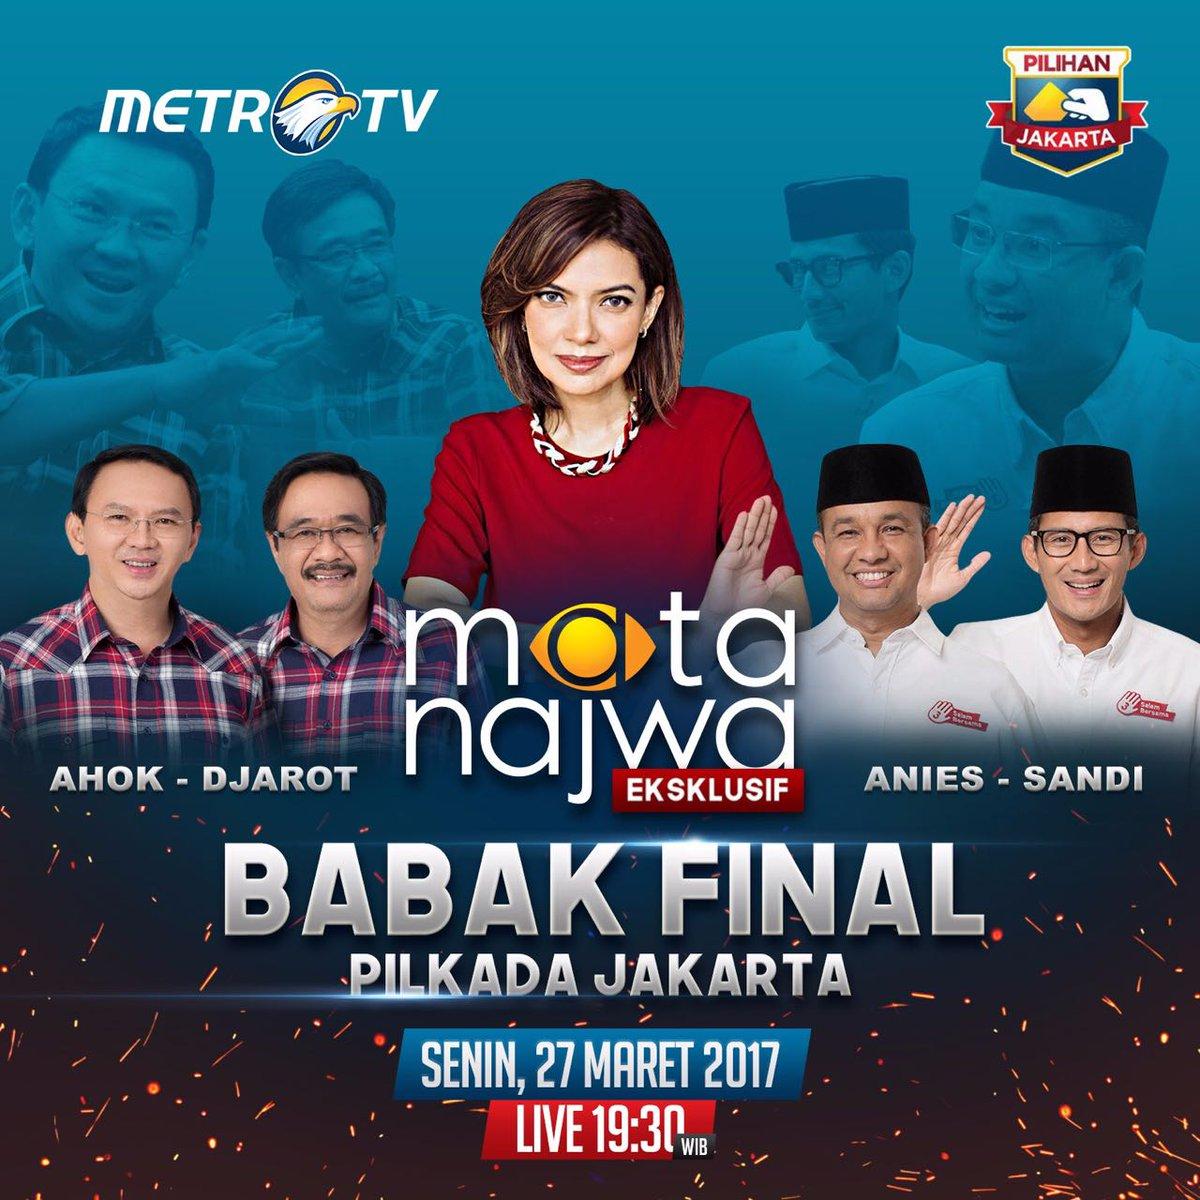 Mata Najwa Bikin Konsep Debat Ahok-Anies Serasa Hillary-Trump https://...